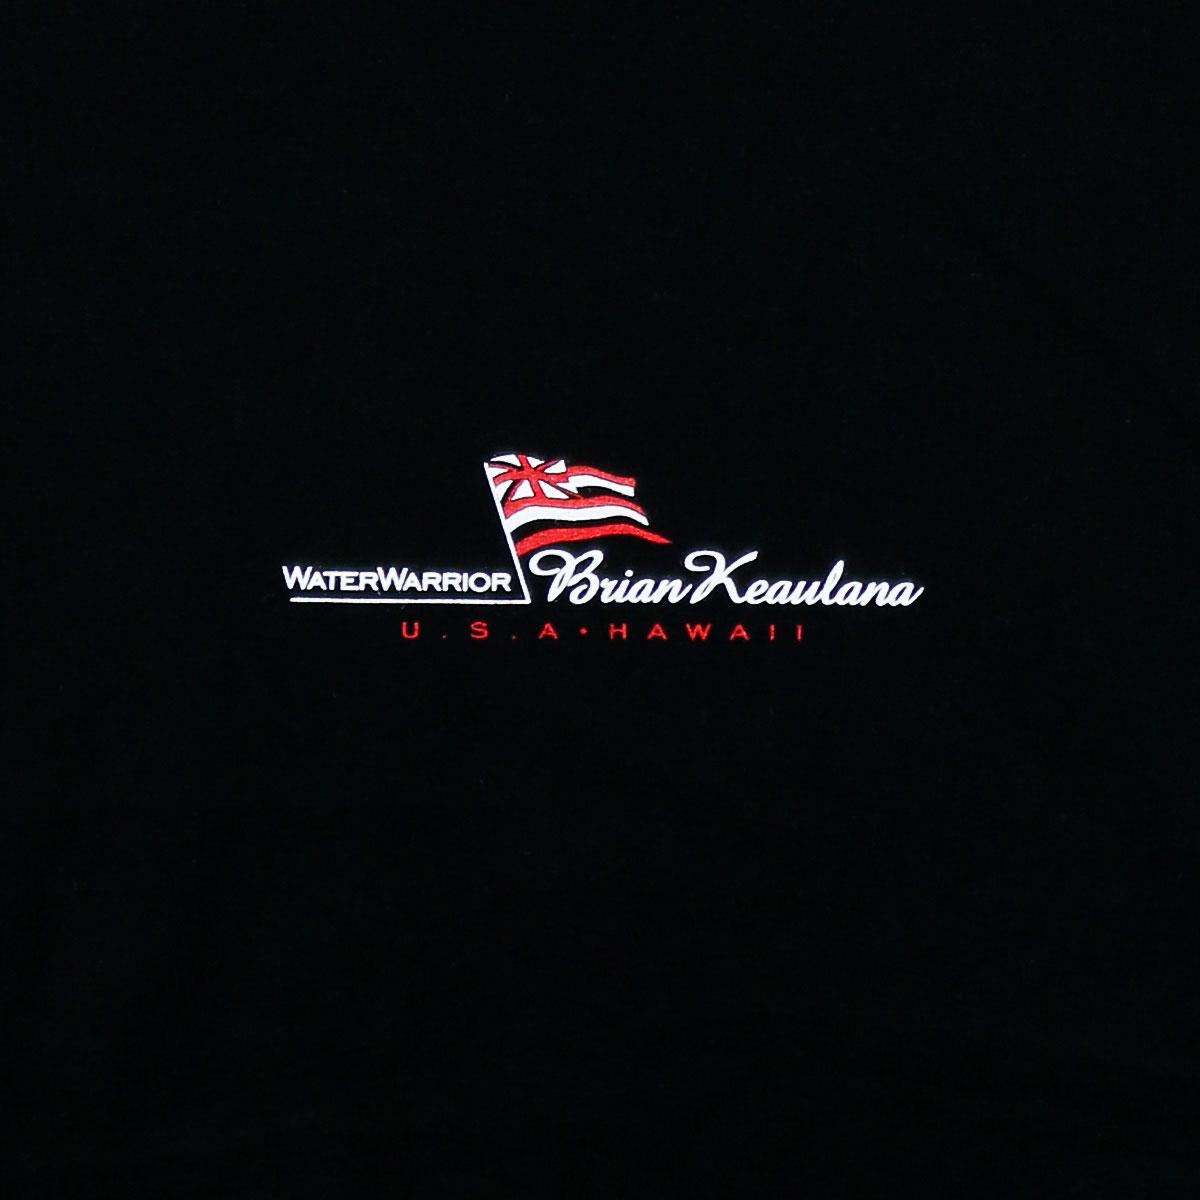 WATER WARRIOR FLAG T-SHIRT BIG SIZE